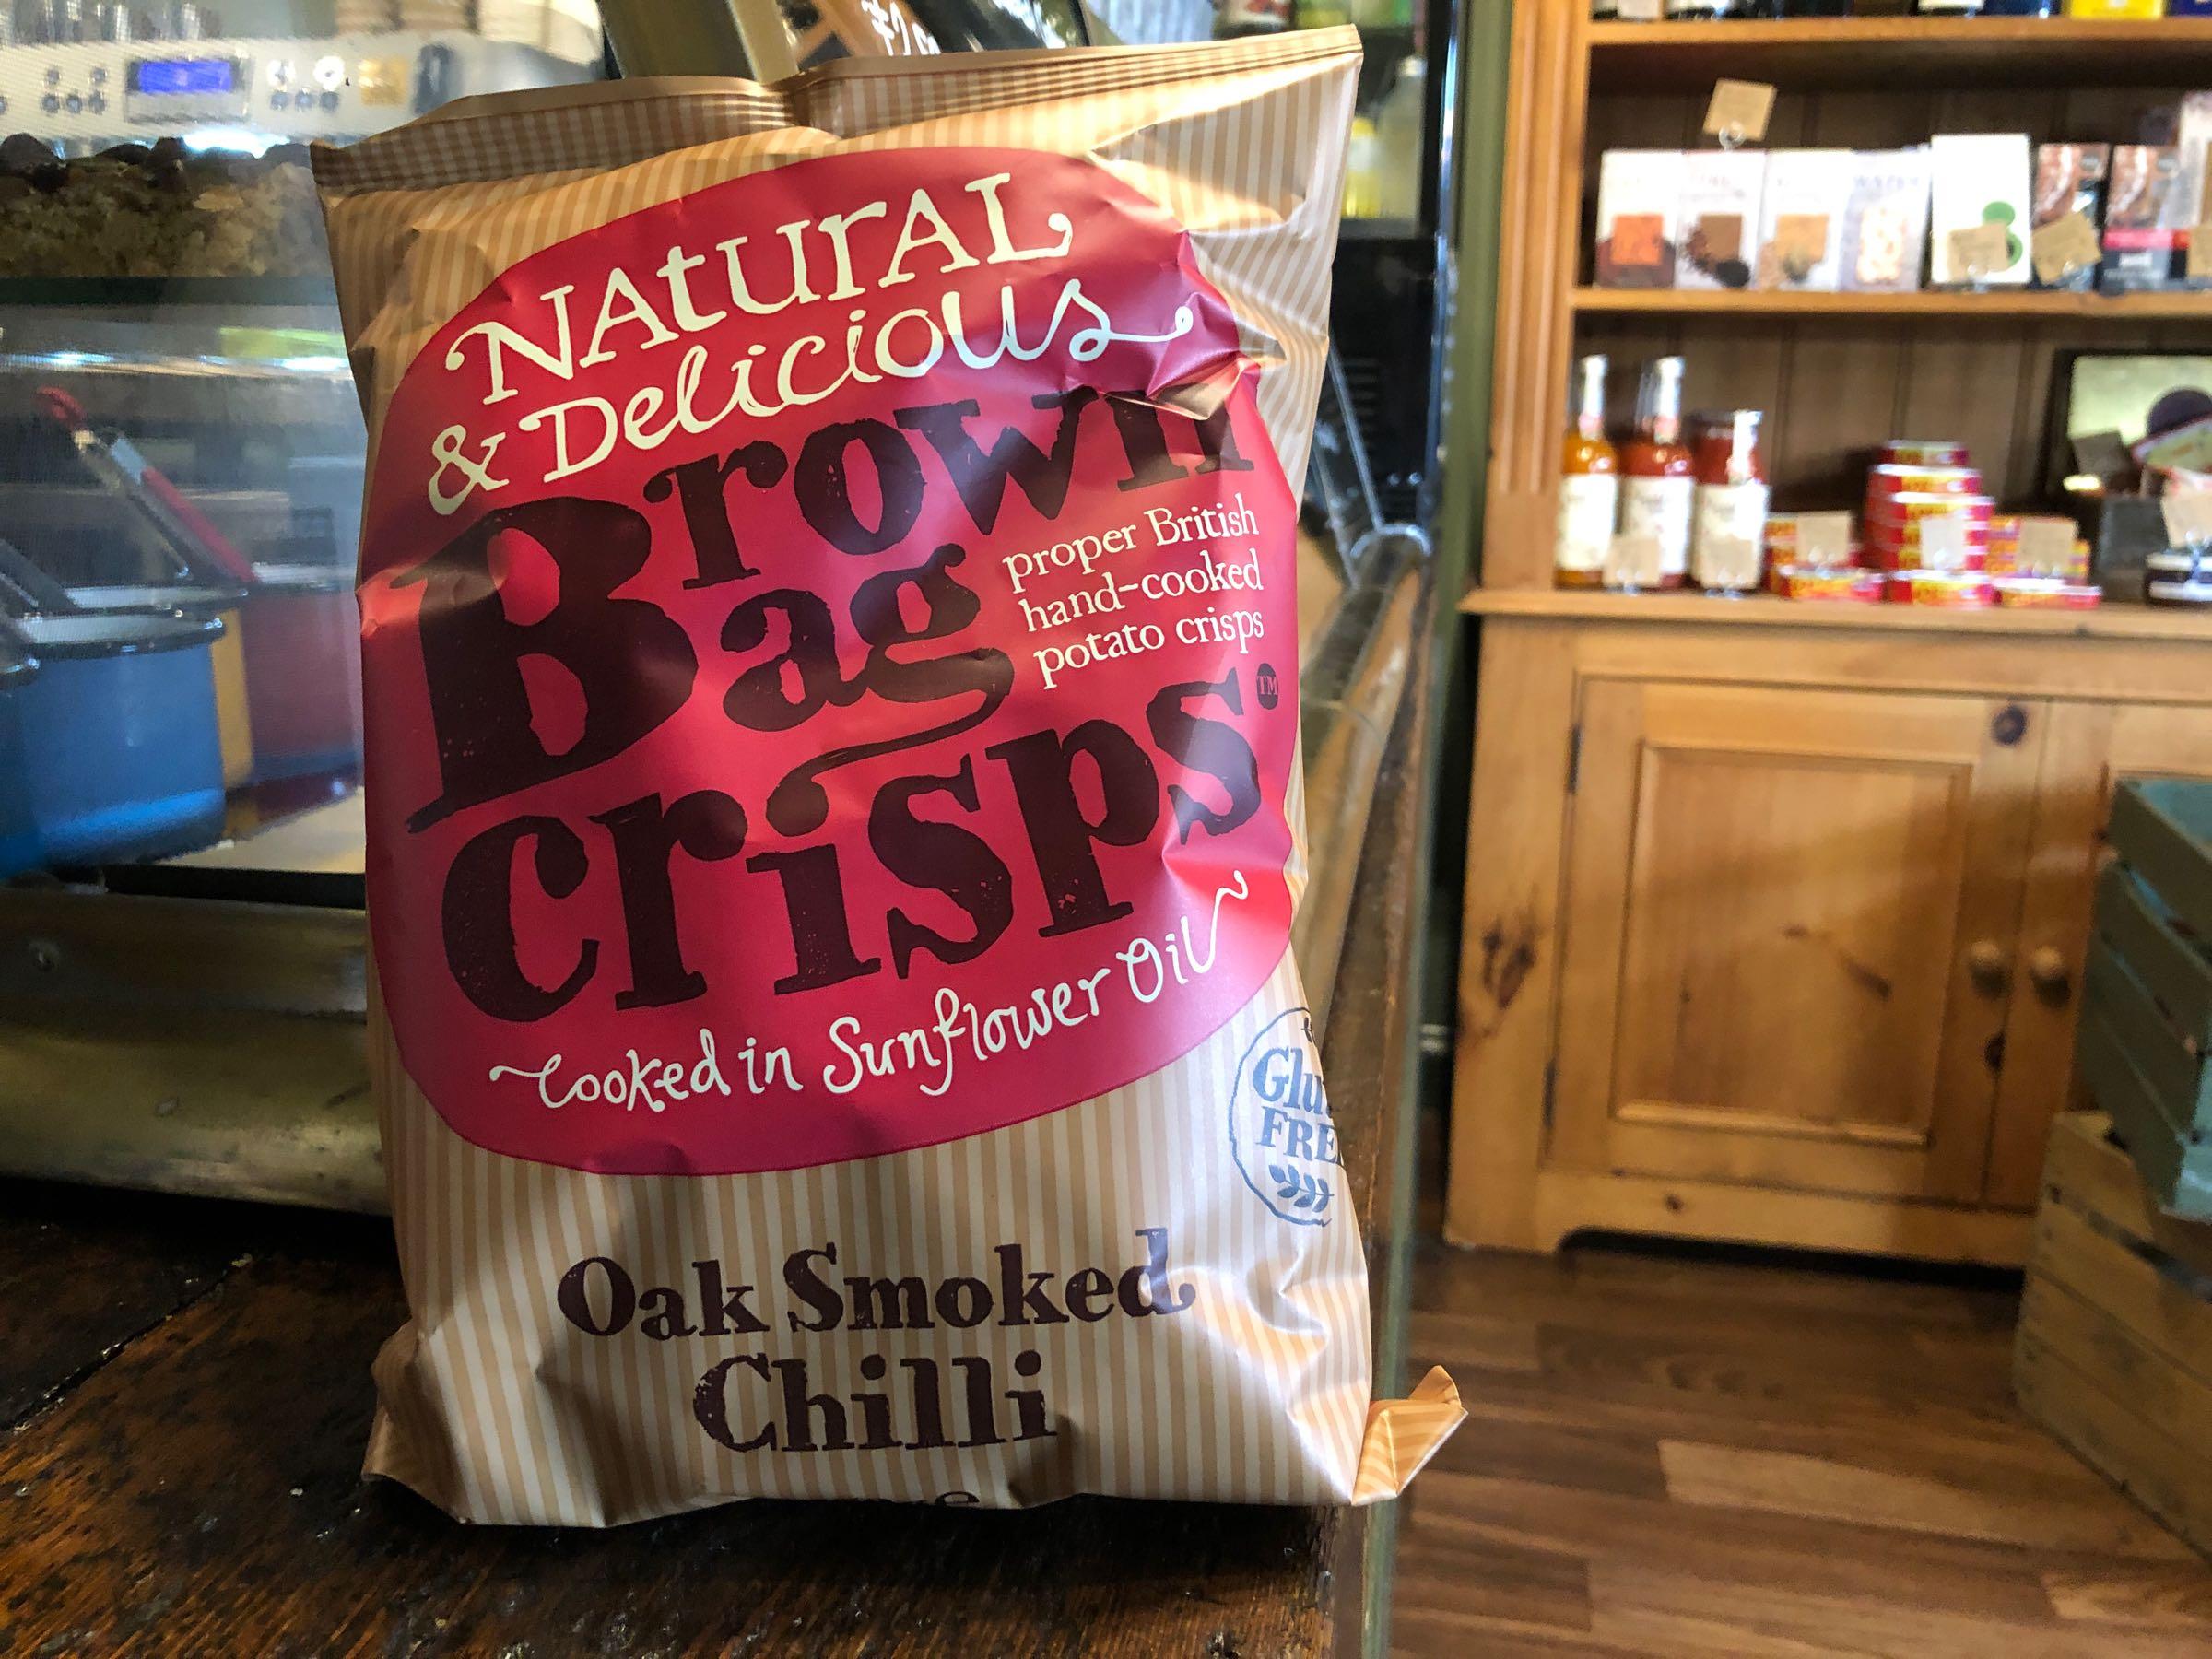 Brown Bag Crisps Oak Smoked Chilli 150g